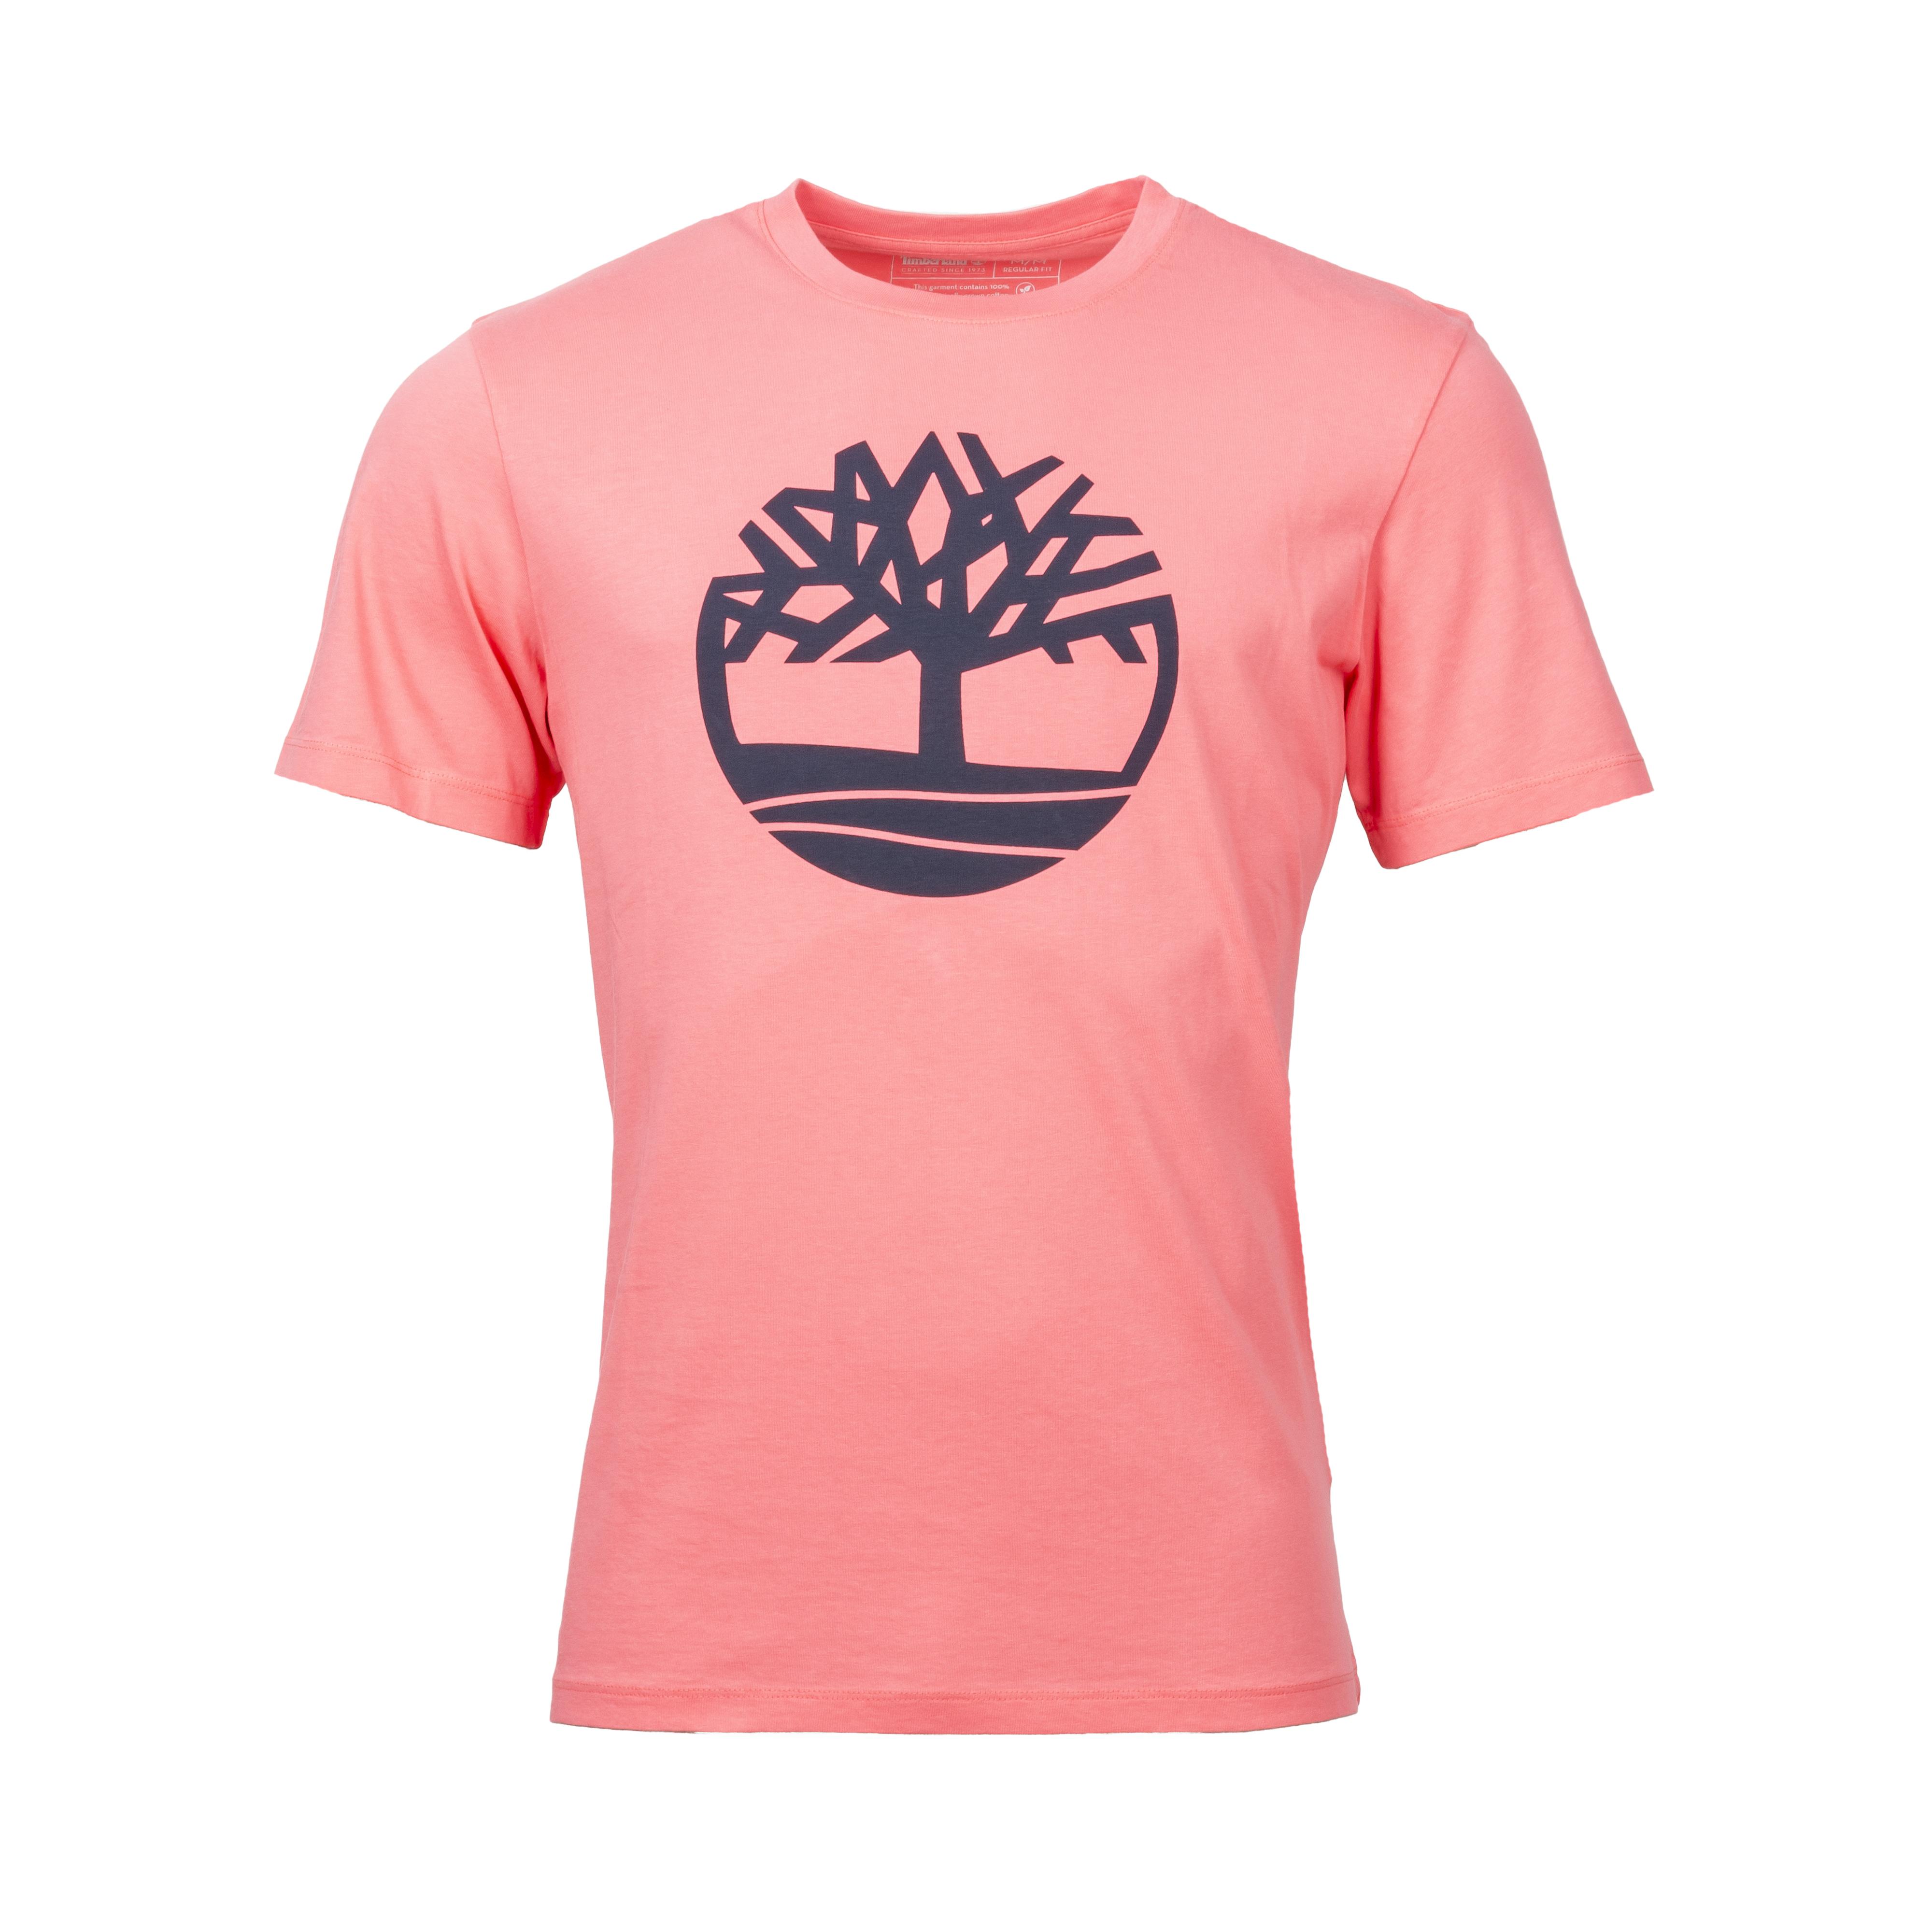 Tee-shirt col rond  en coton rose floqué en noir